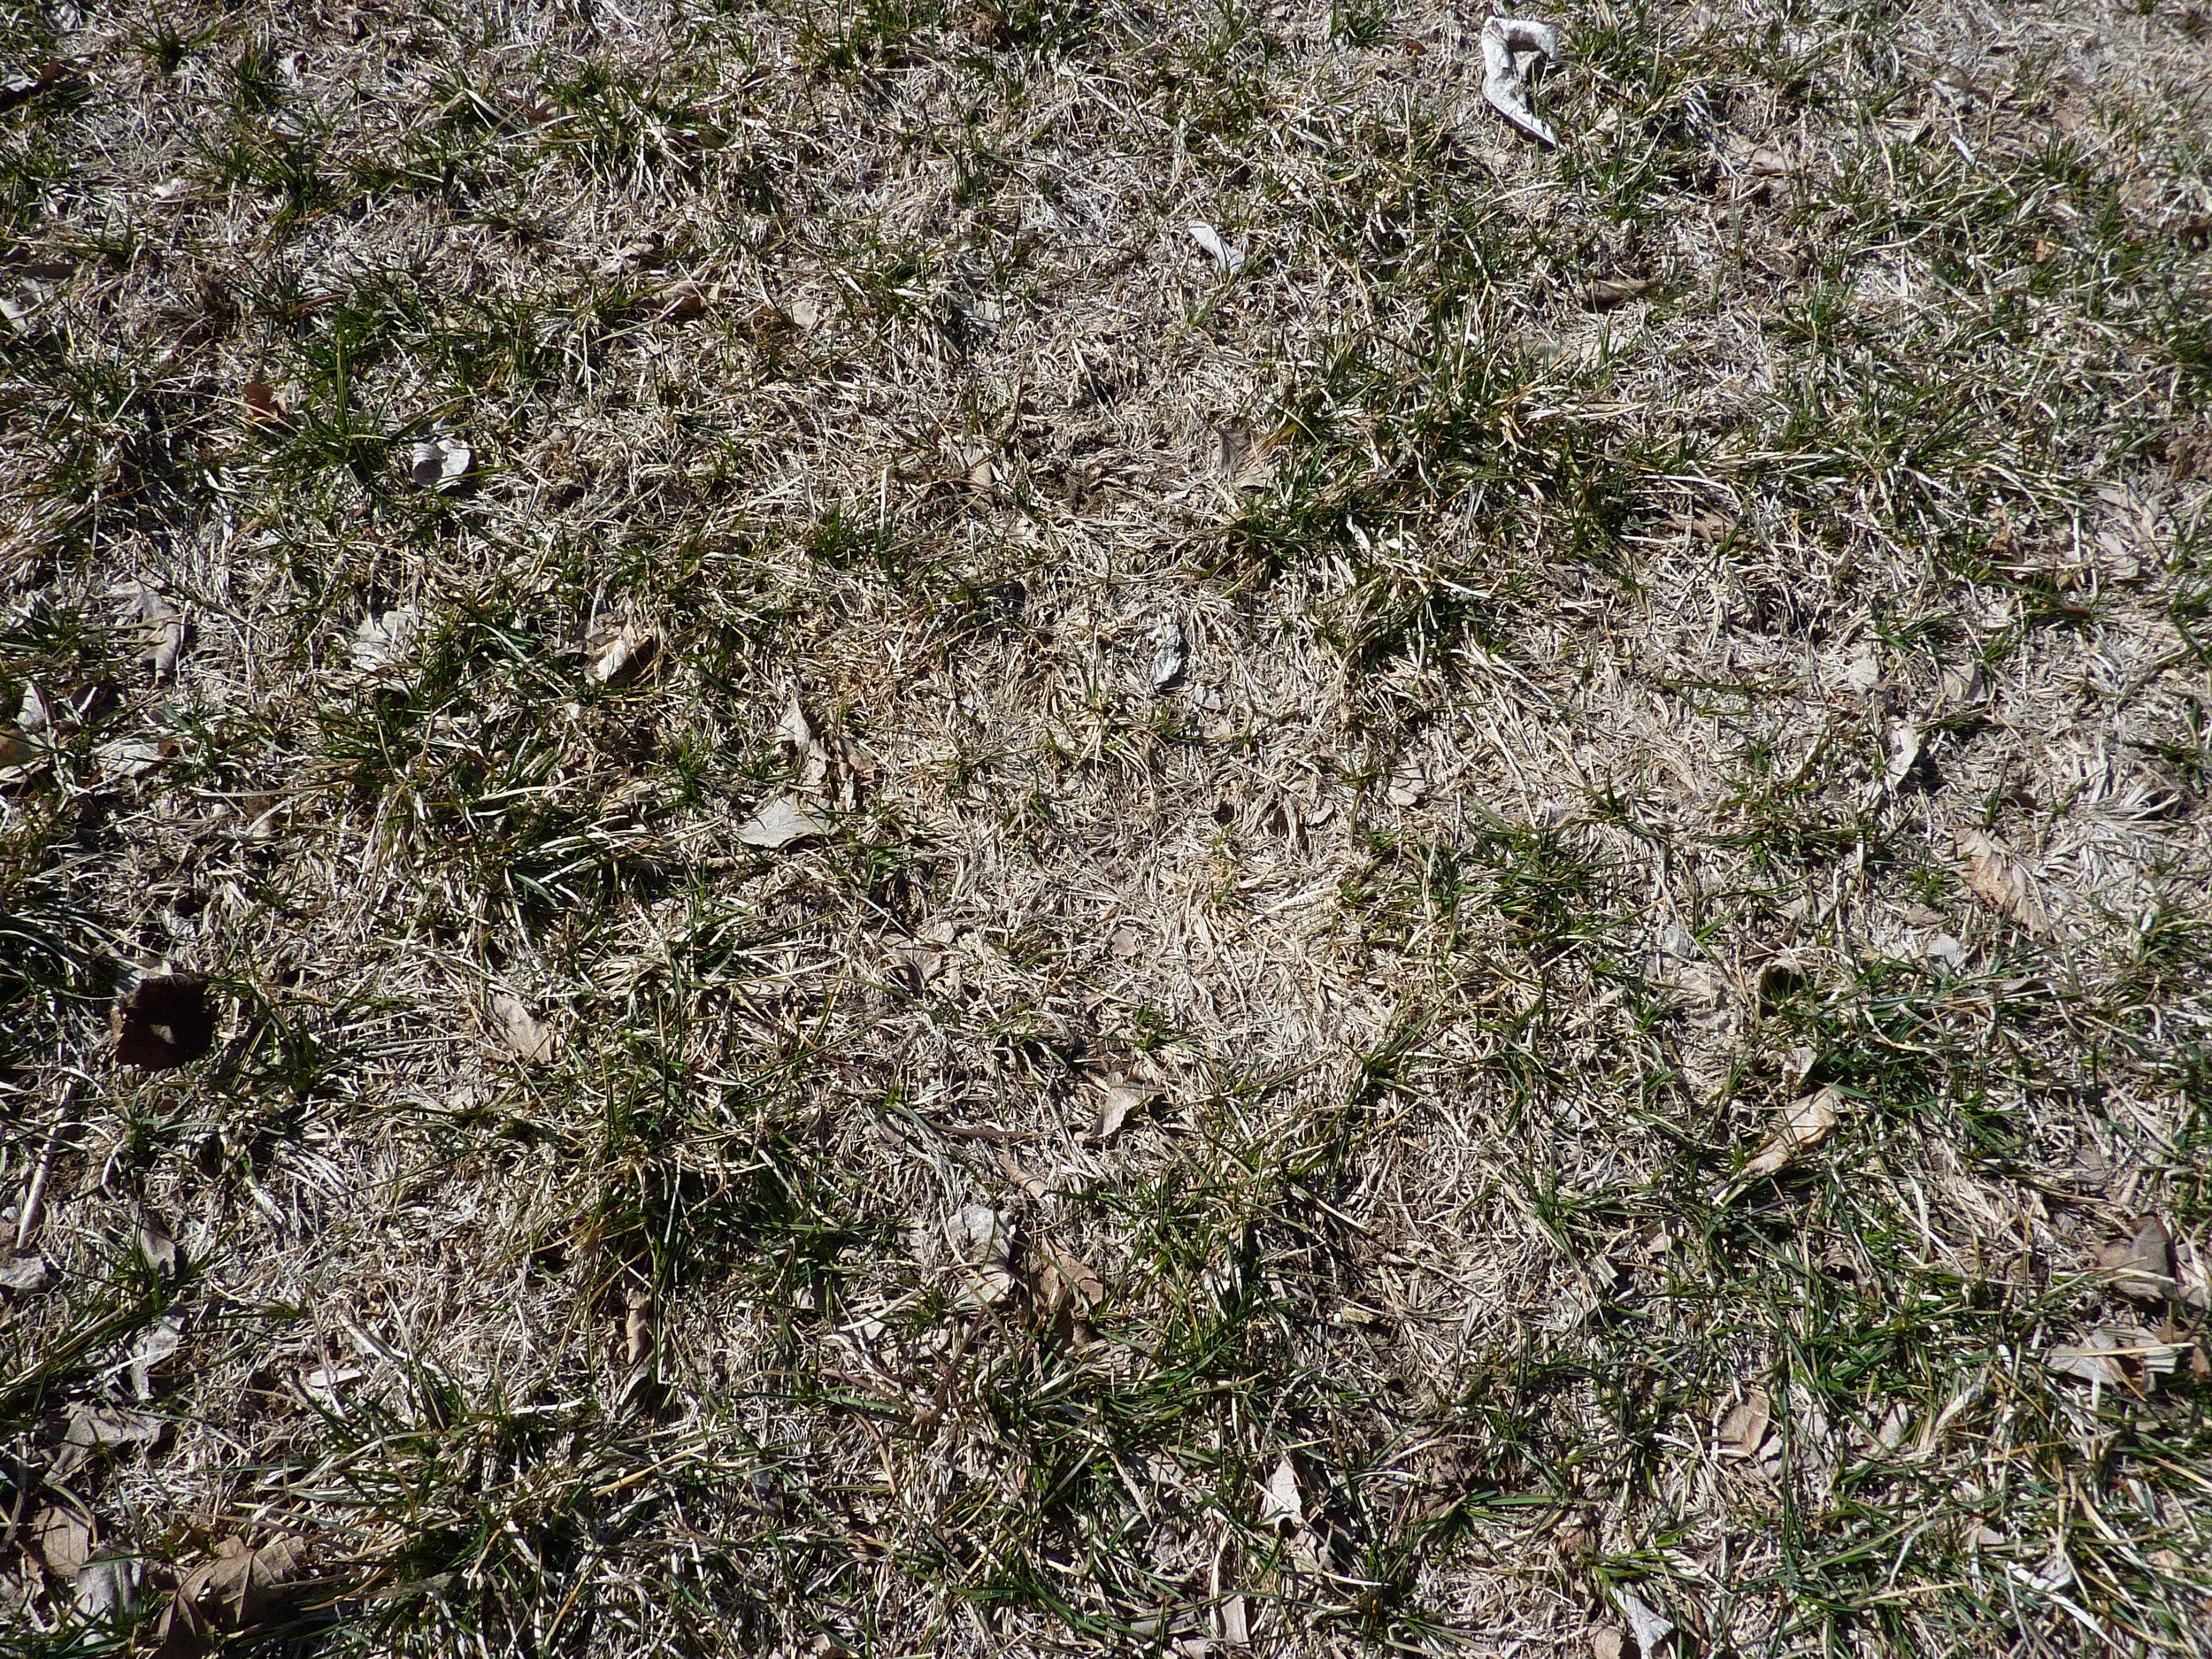 Severe drought damage.